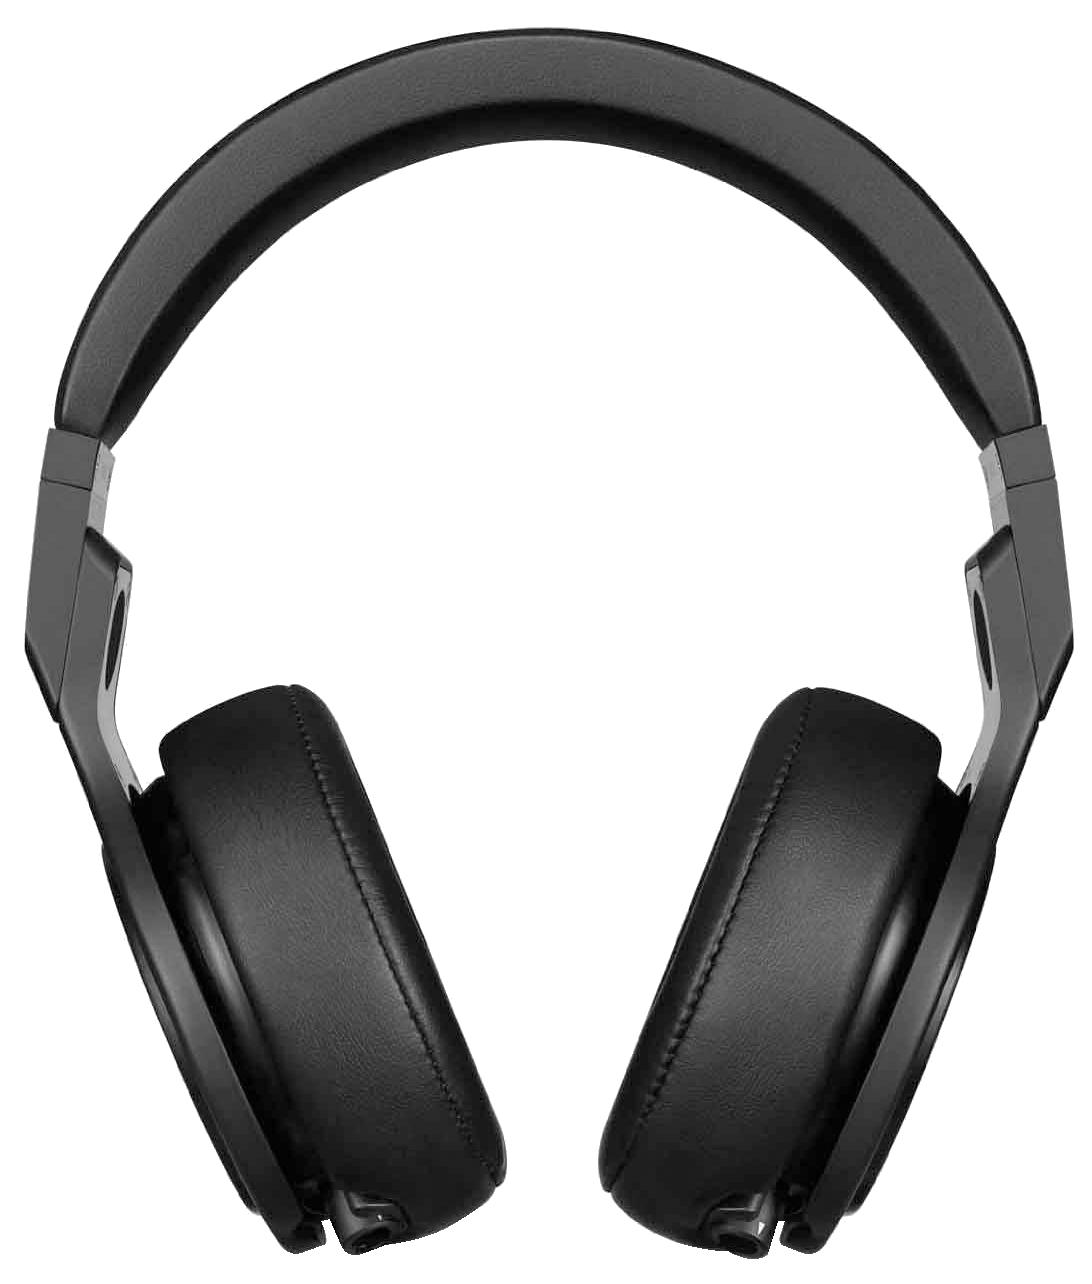 Headphone PNG Image